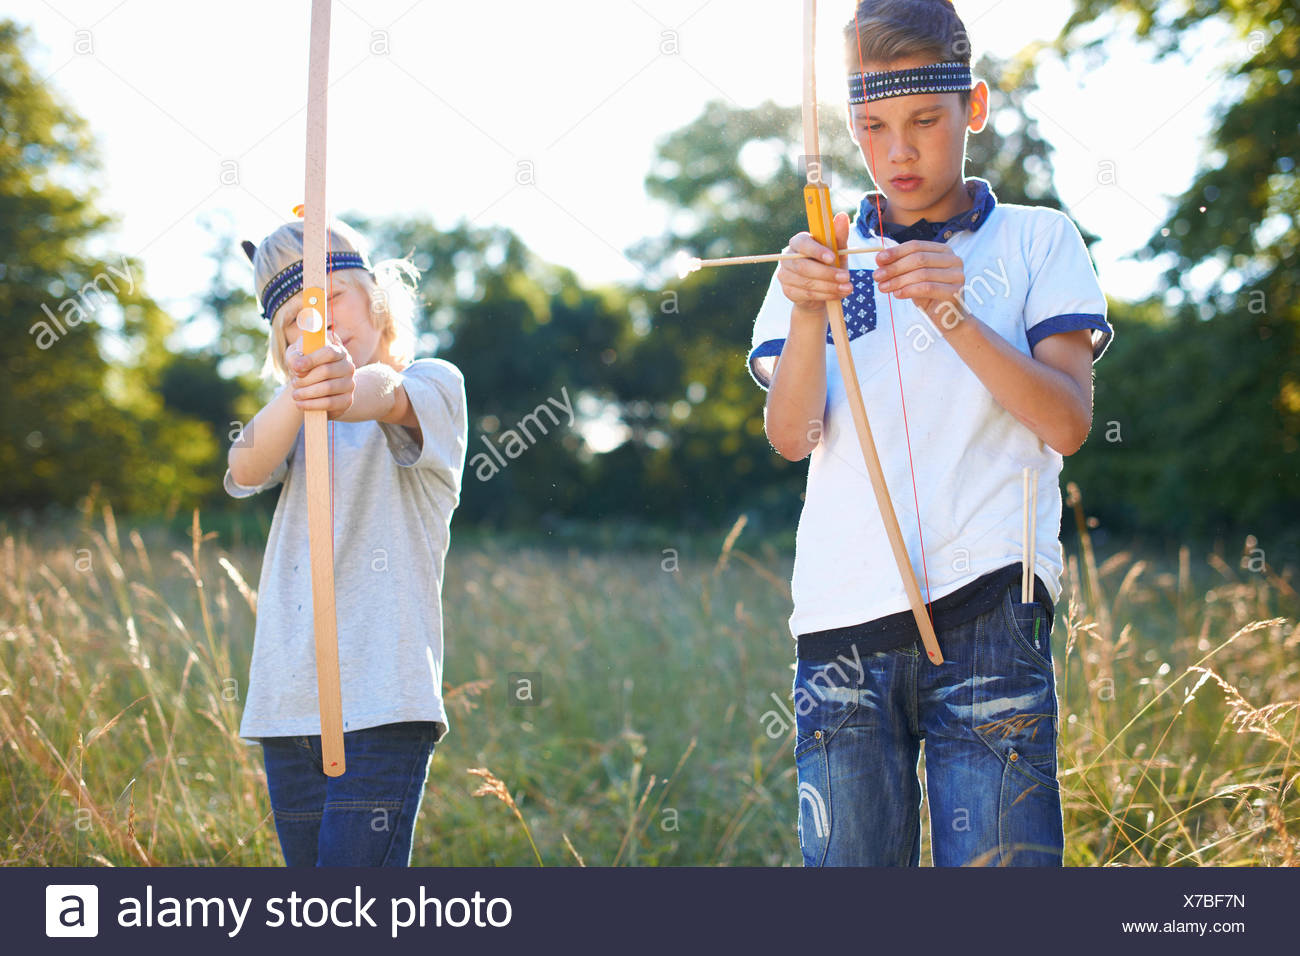 Deux jeunes garçons tenant arc et flèche Photo Stock